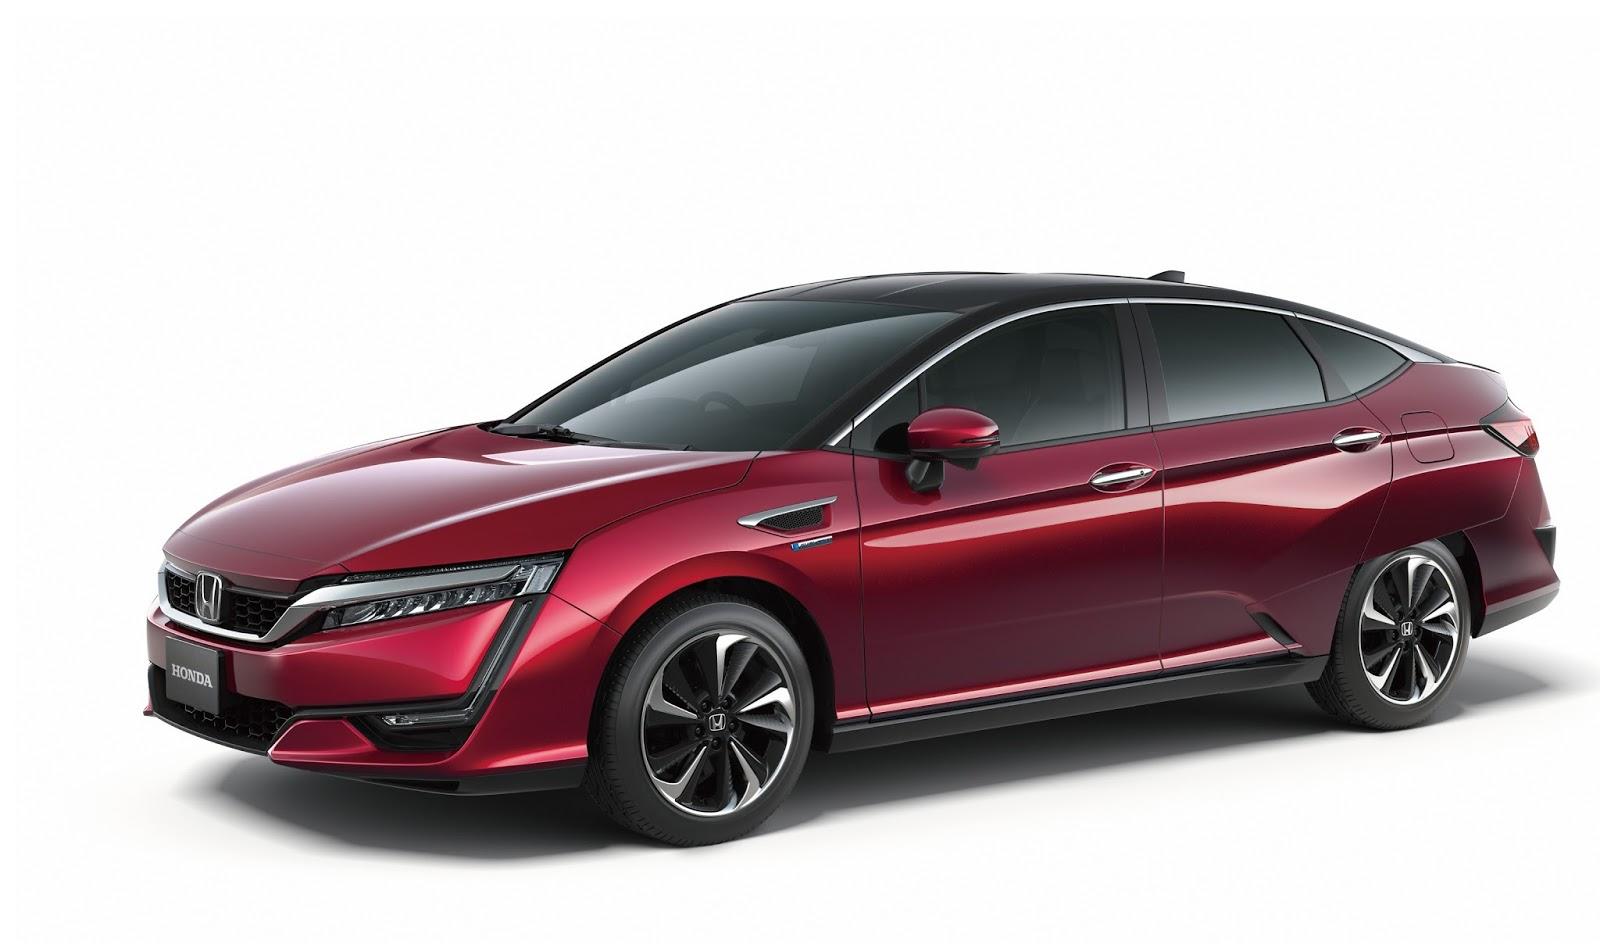 61772 Global debut of Honda s all new FCV vehicle Η Honda θα παρουσιάσει το S660, ενα λιλιπούτειο διθέσιο roadster με 63 άλογα από μολις 658 κ.εκ